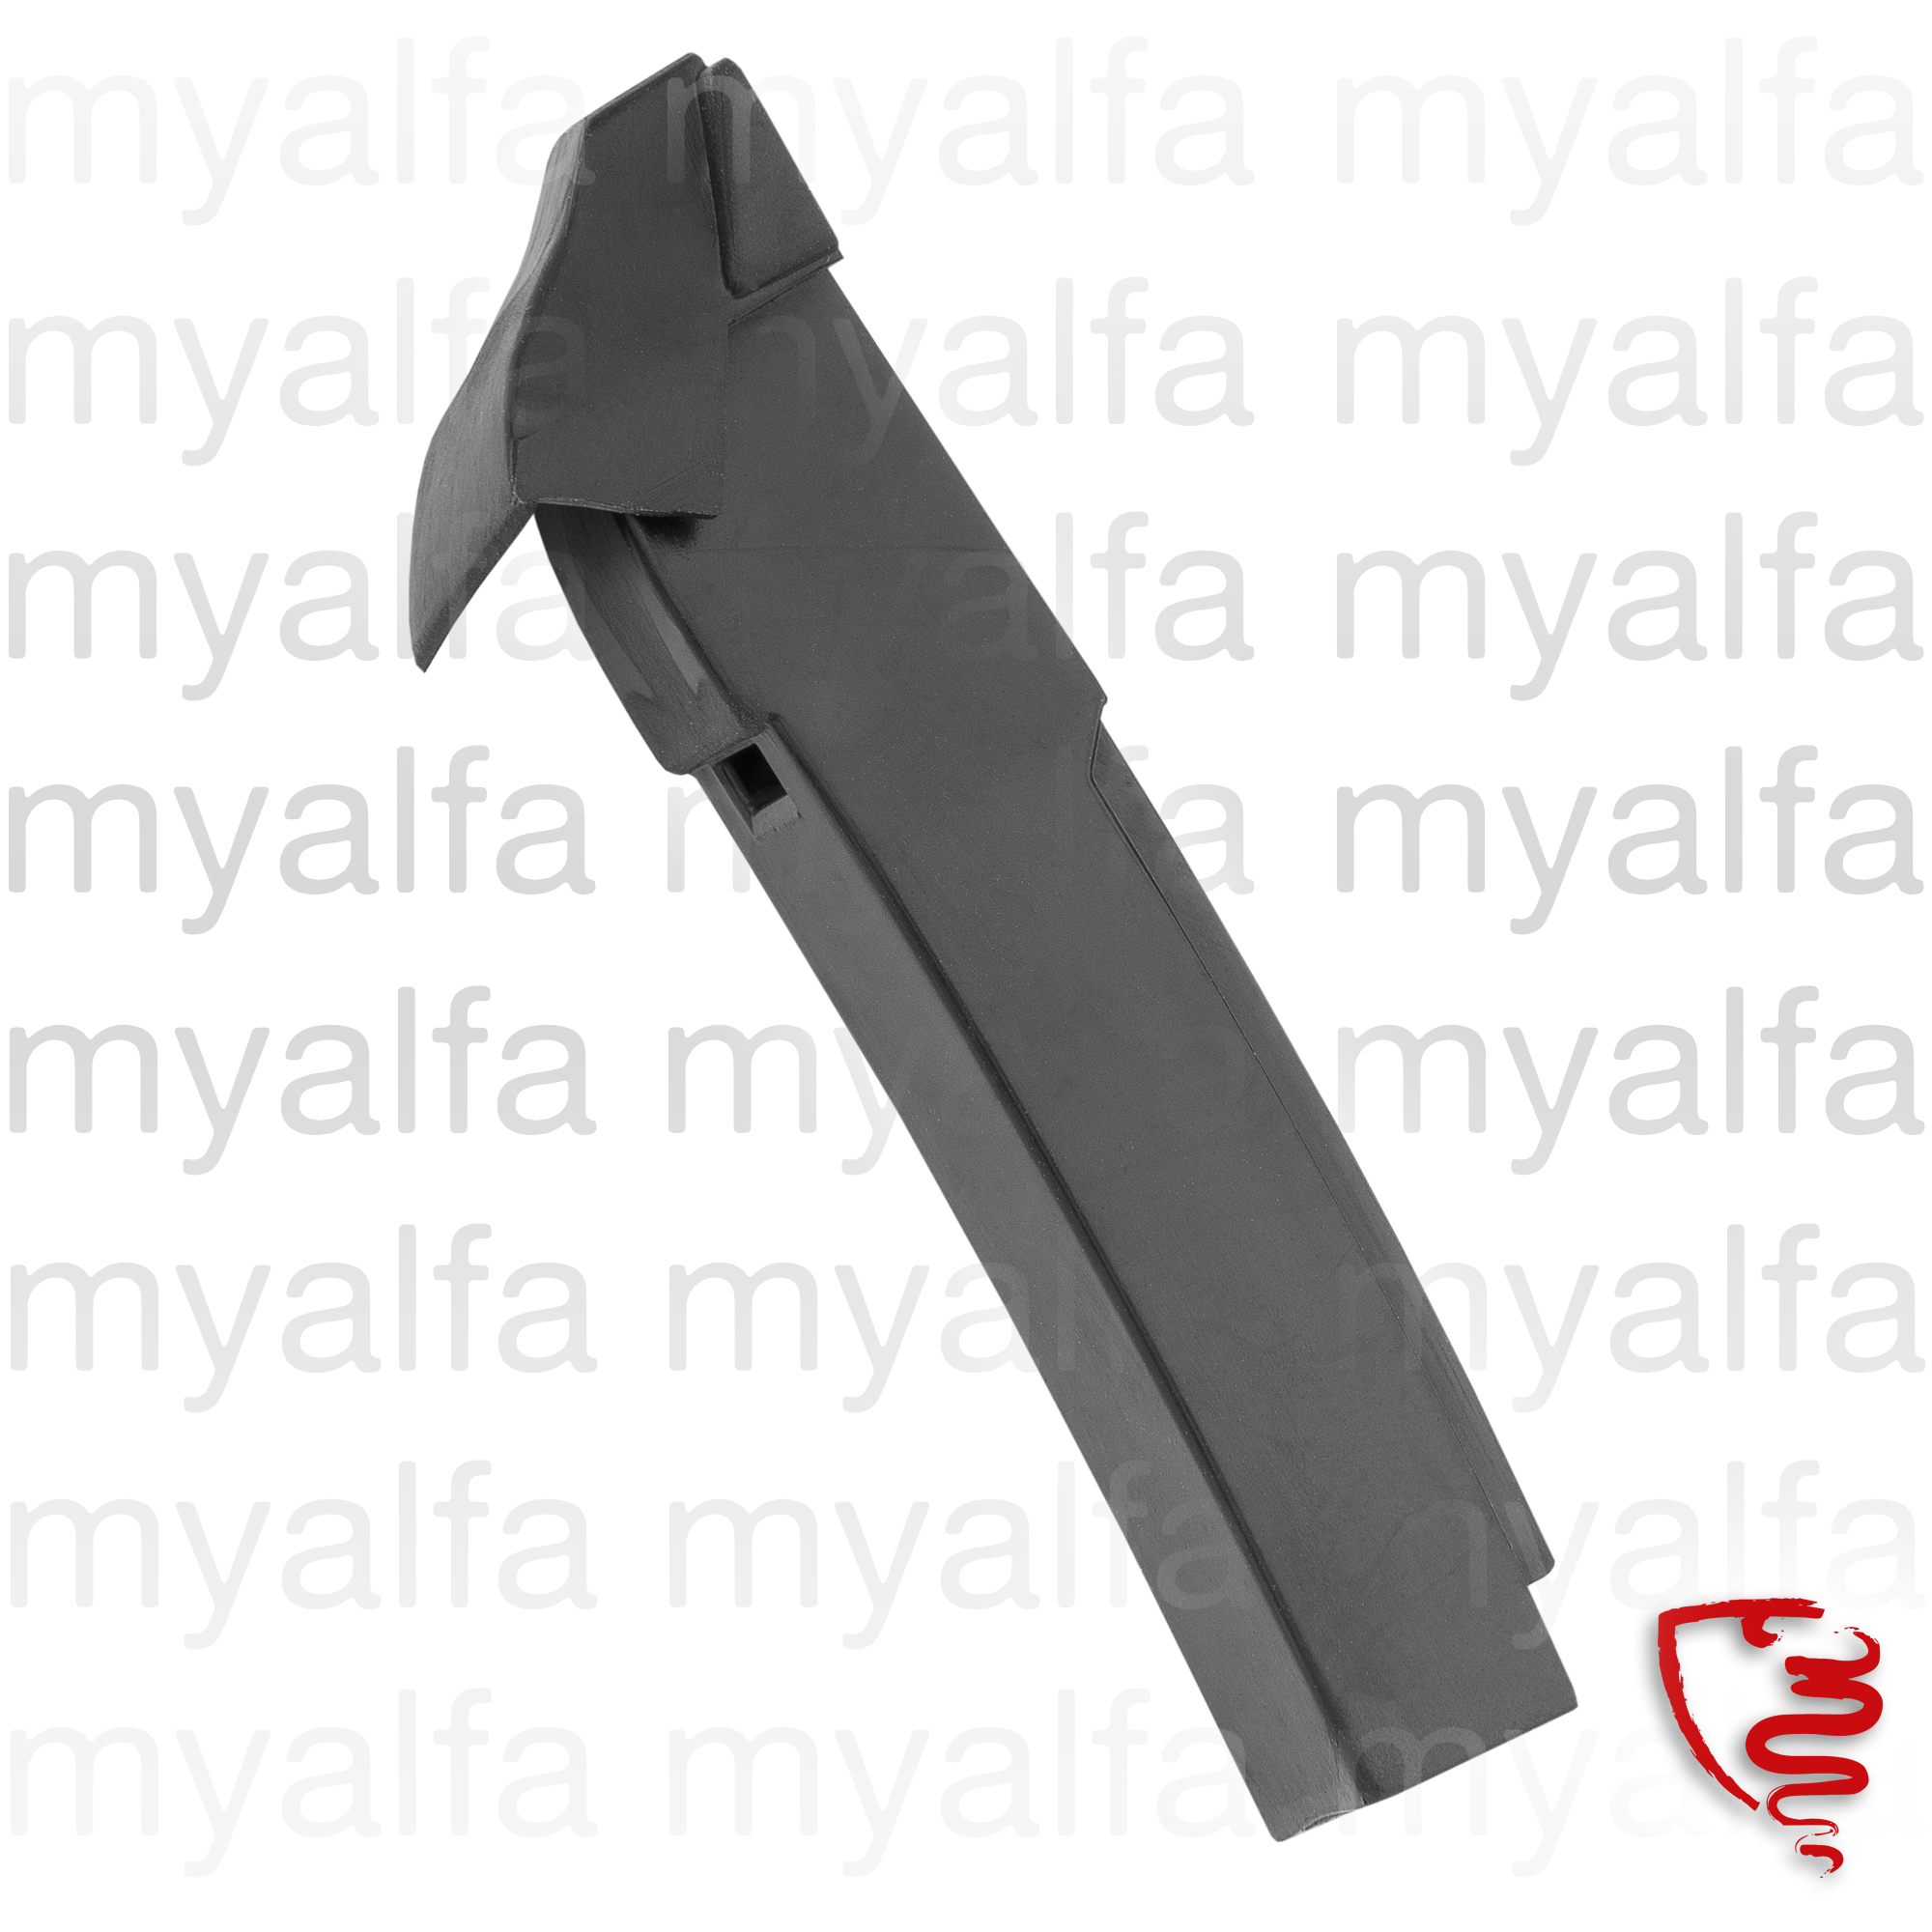 glass trough sealing door GT - esq. for 105/115, Coupe, Body parts, Rubber parts, Door grommets/felt/seals